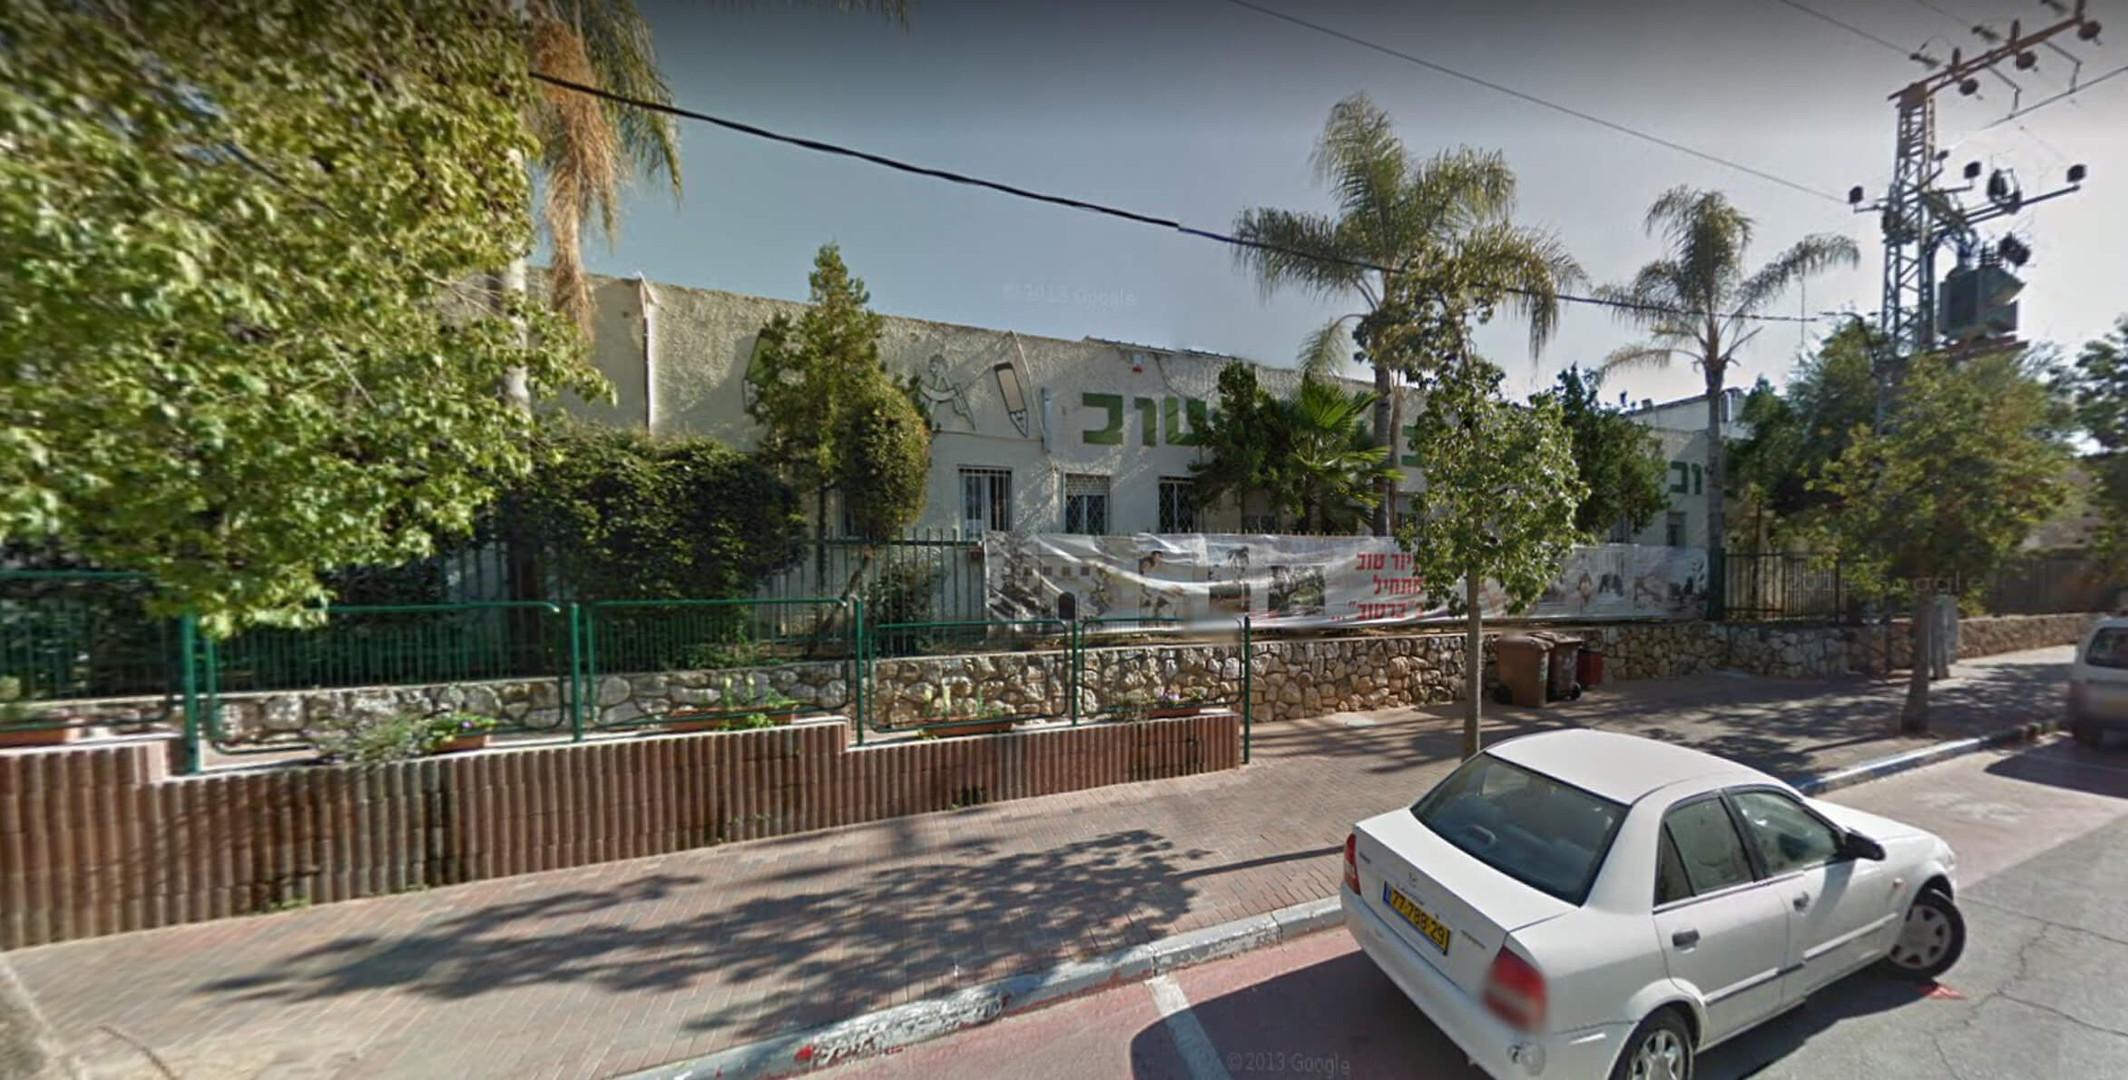 Google Maps, street view